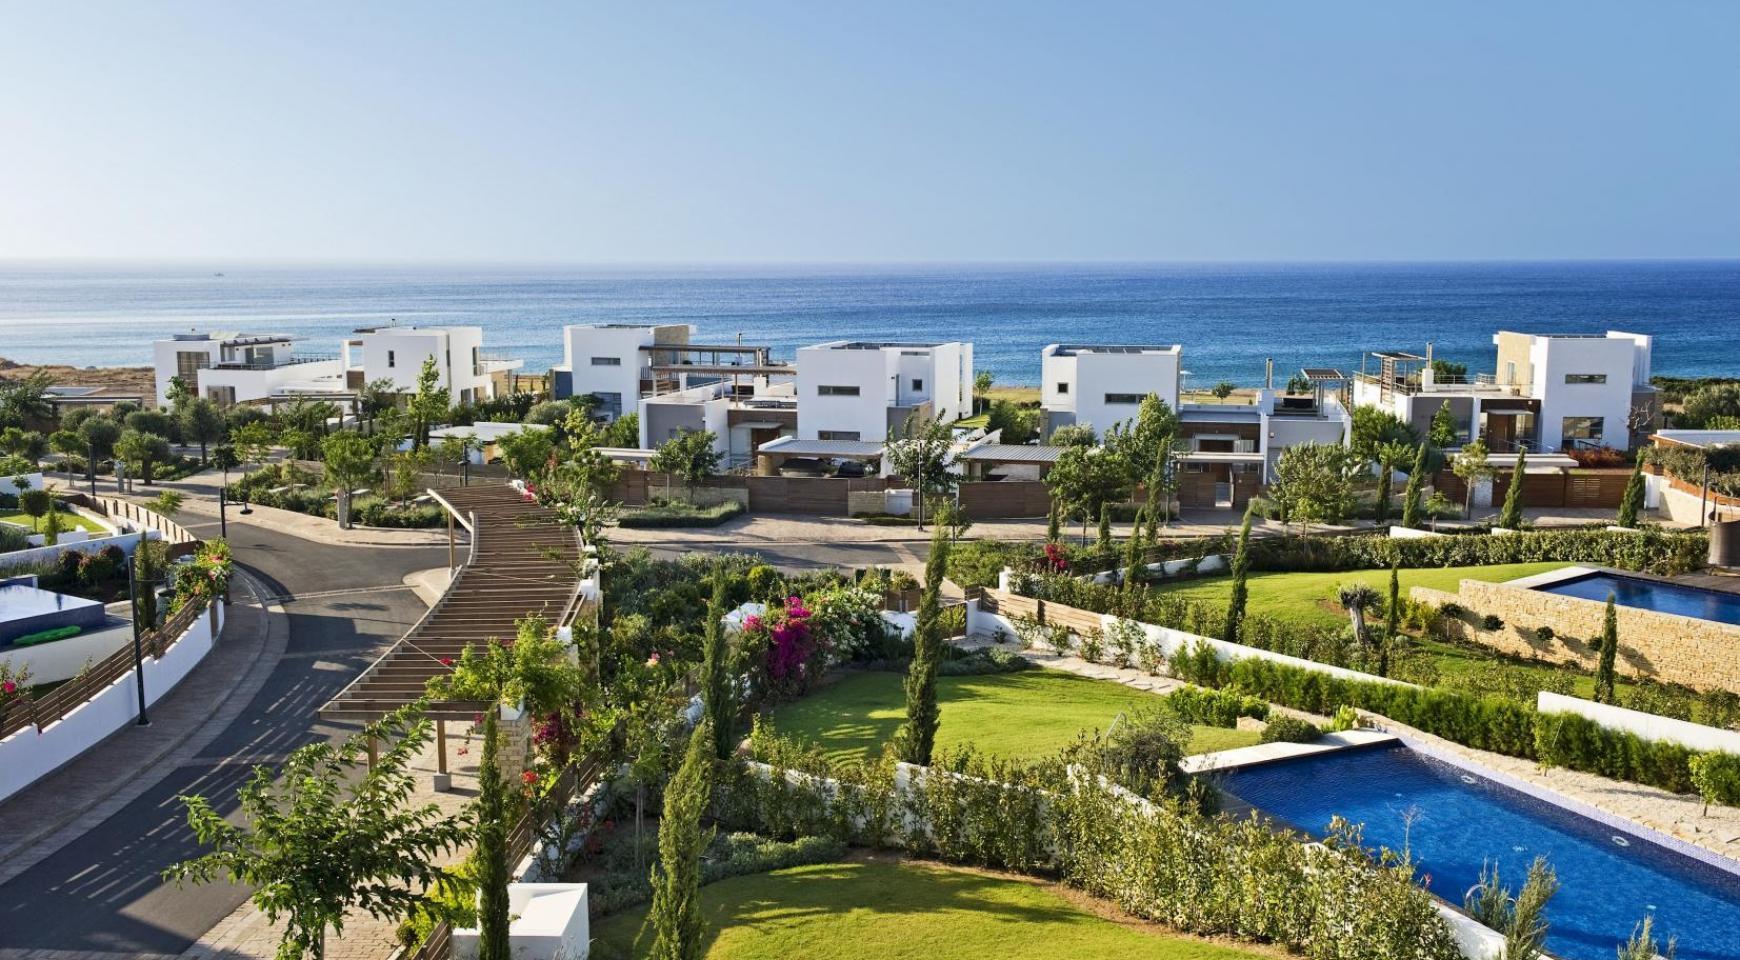 4 Bedroom Villa with Sea Views near Latsi - 16